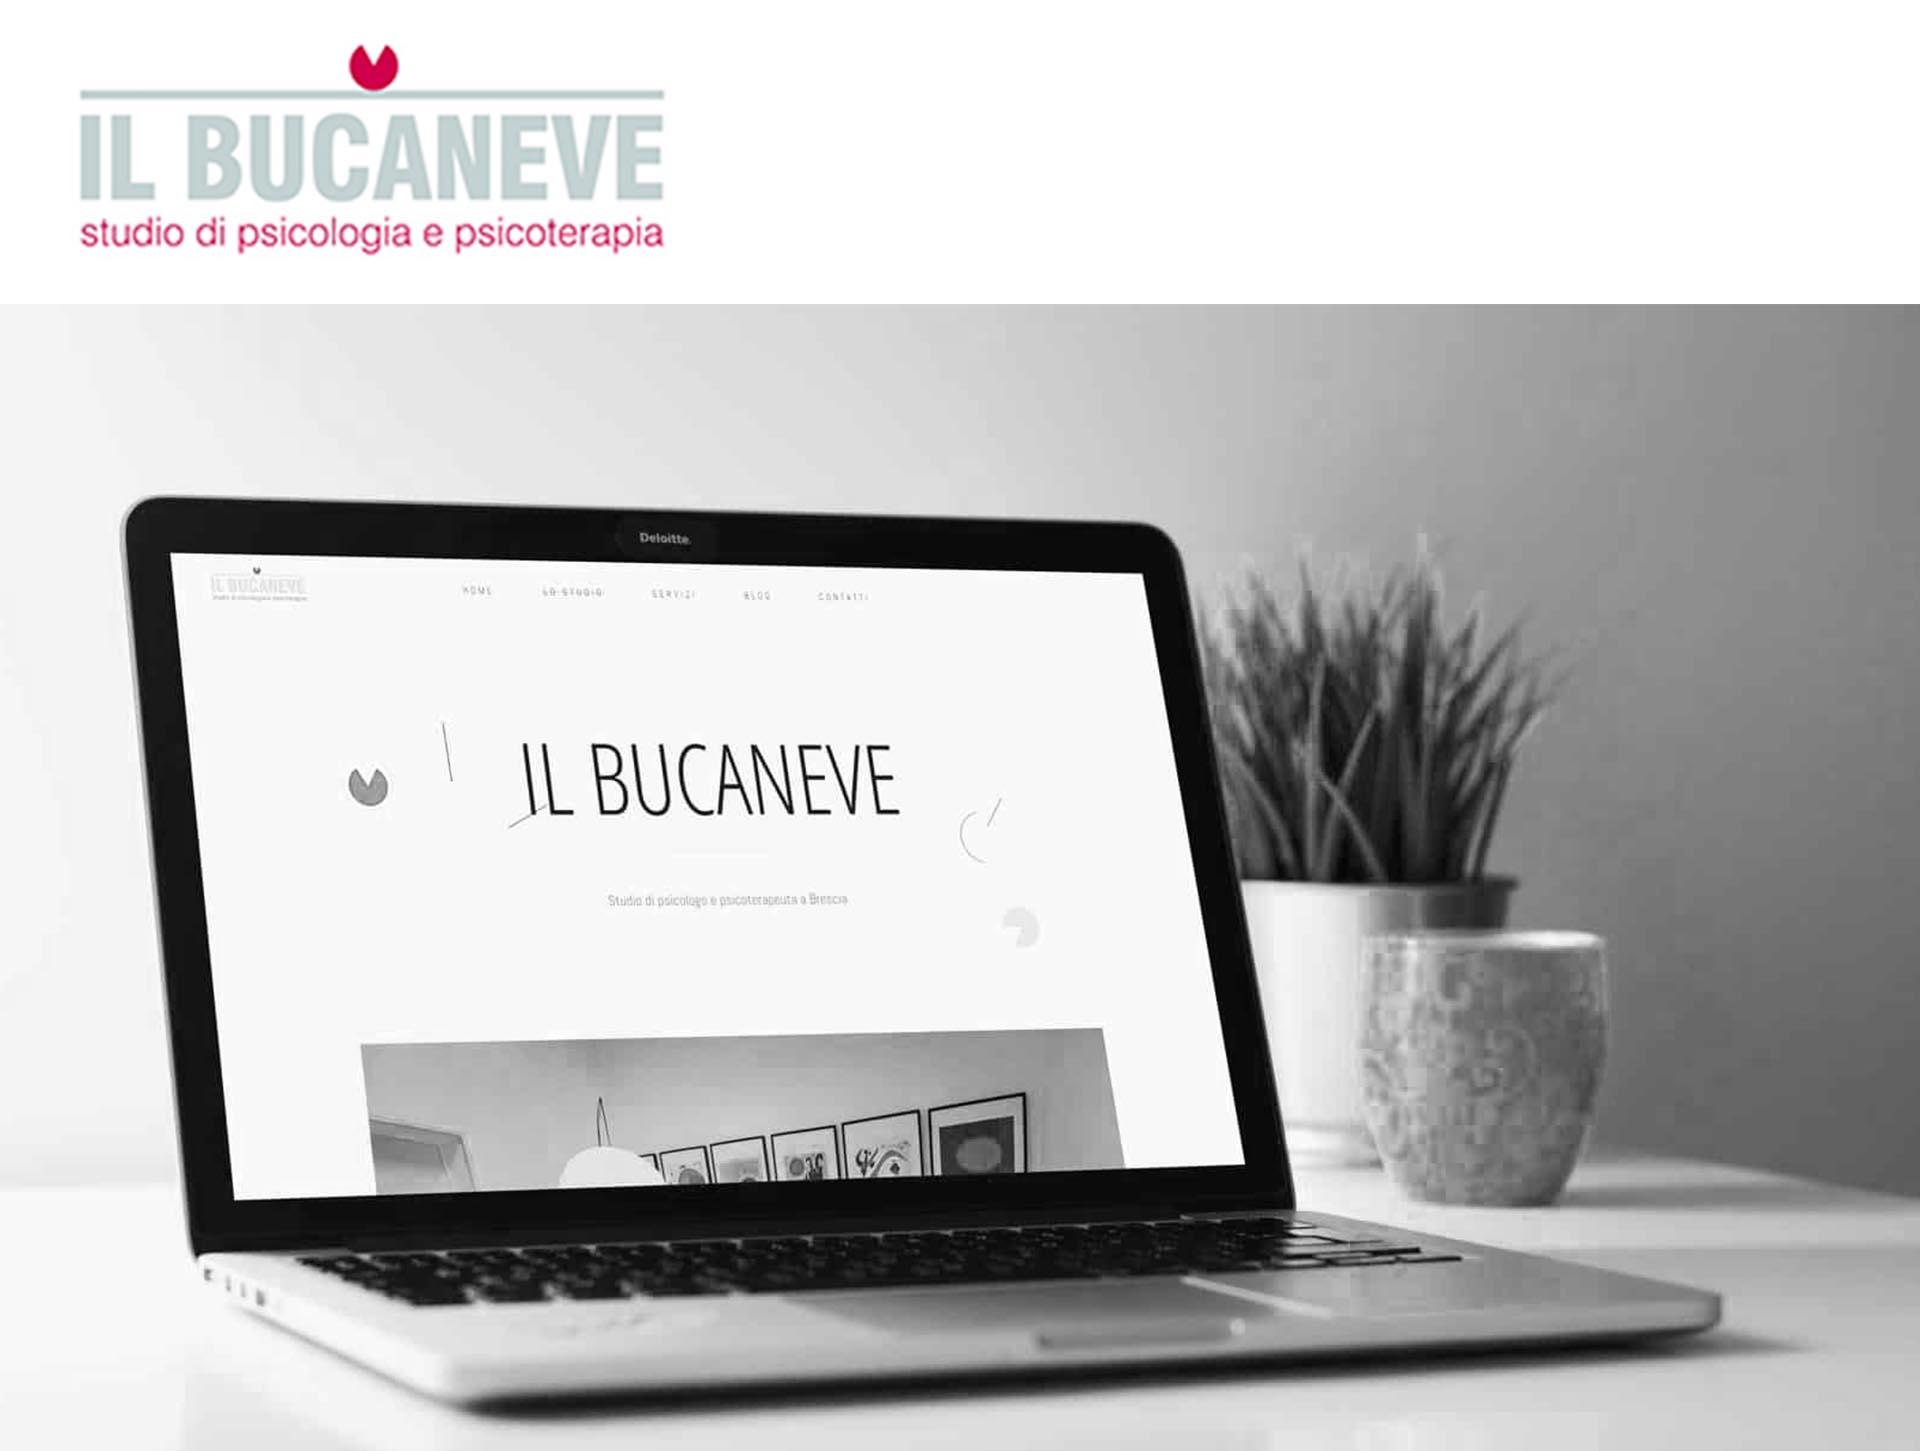 IL BUCANEVE